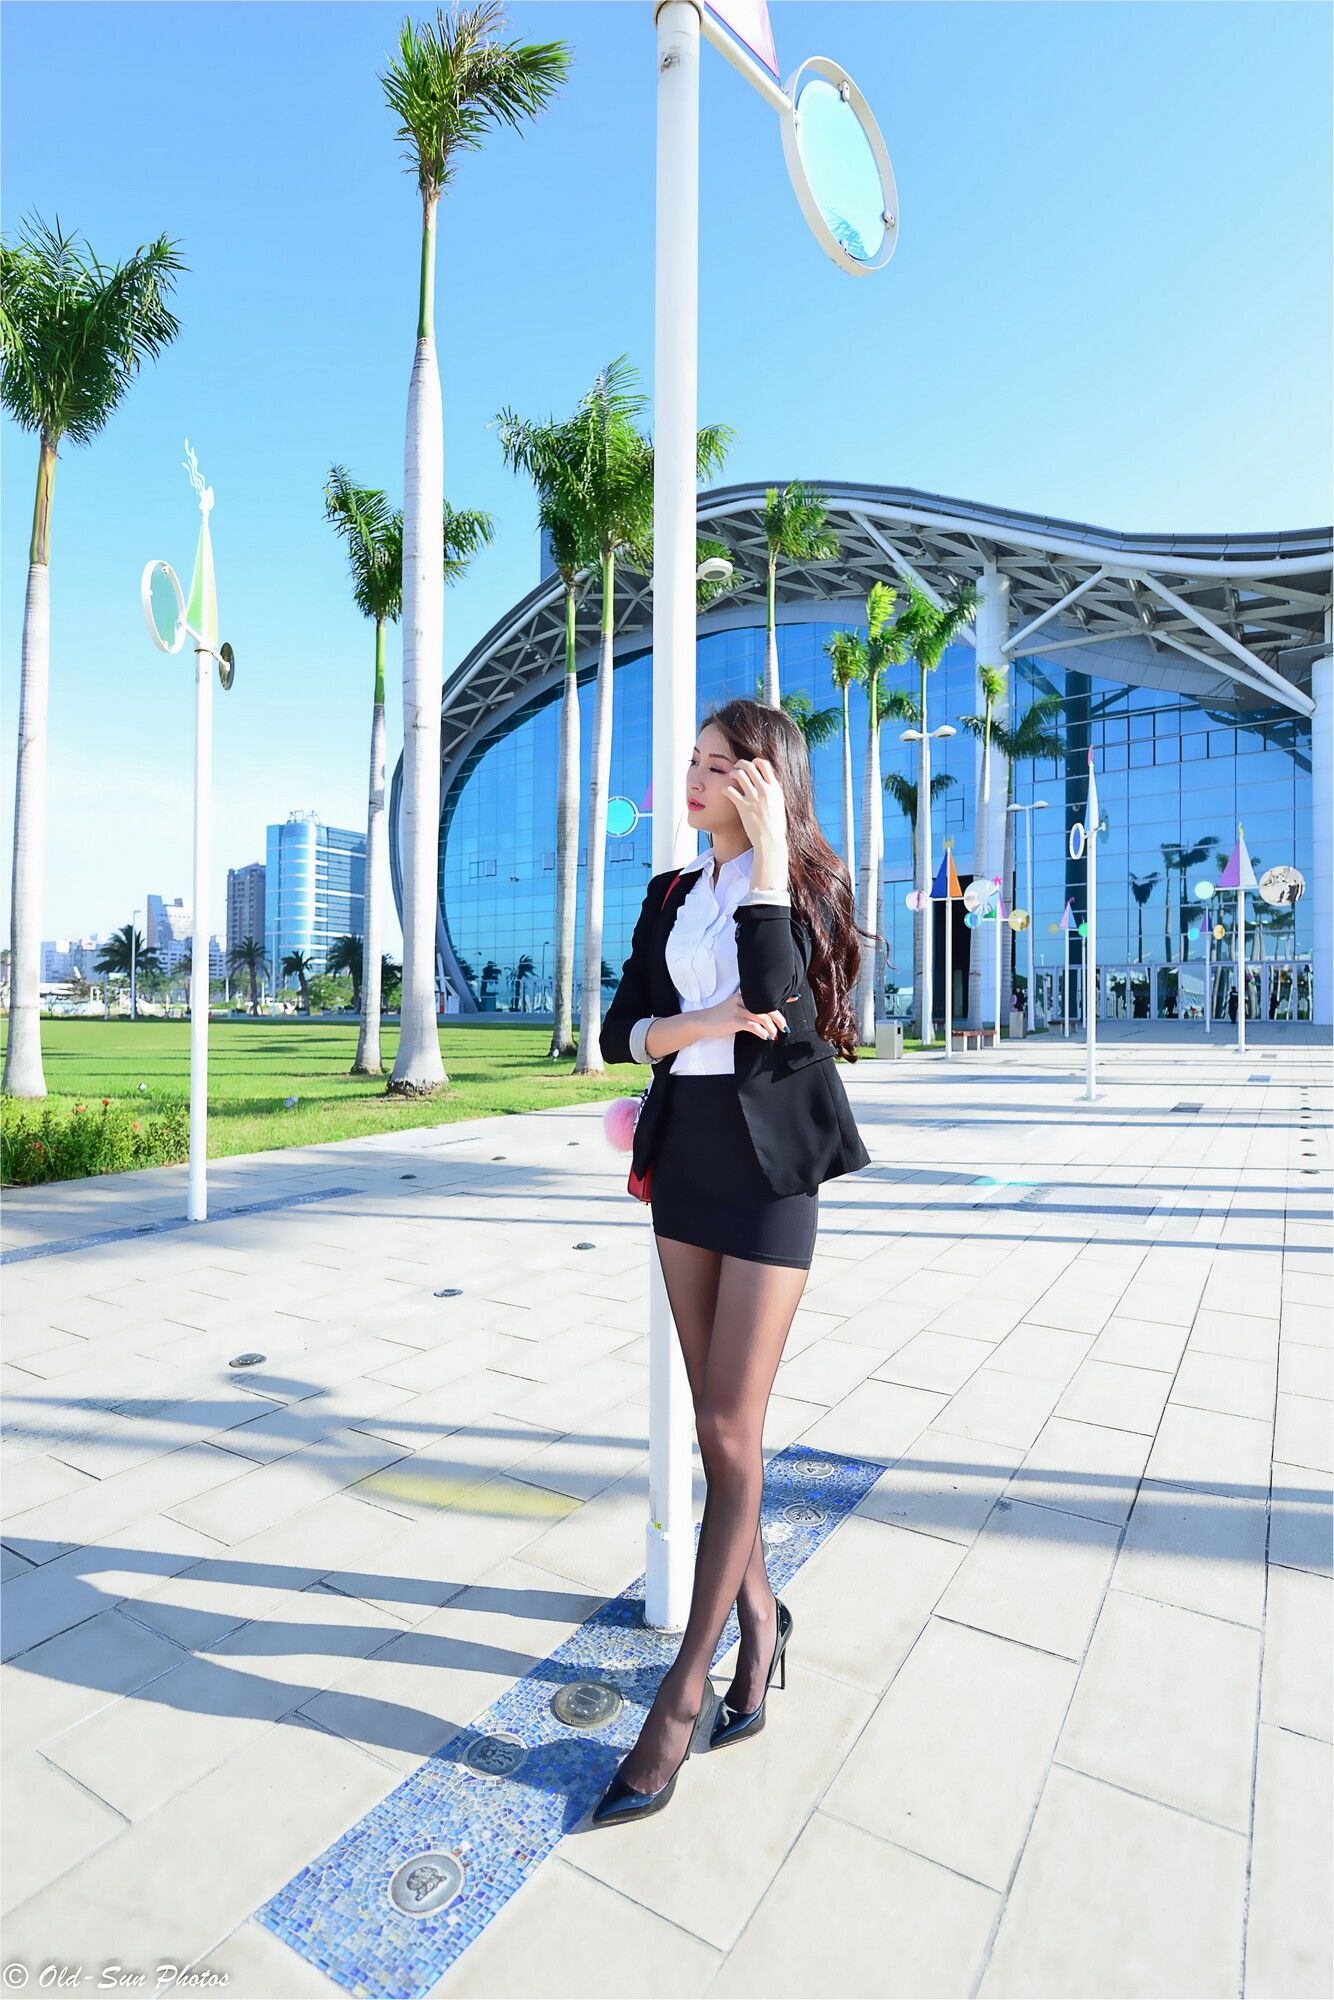 VOL.771 [台湾正妹]丝袜美腿西装美女长腿美女街拍高跟白领丽人:小梵超高清个人性感漂亮大图(86P)